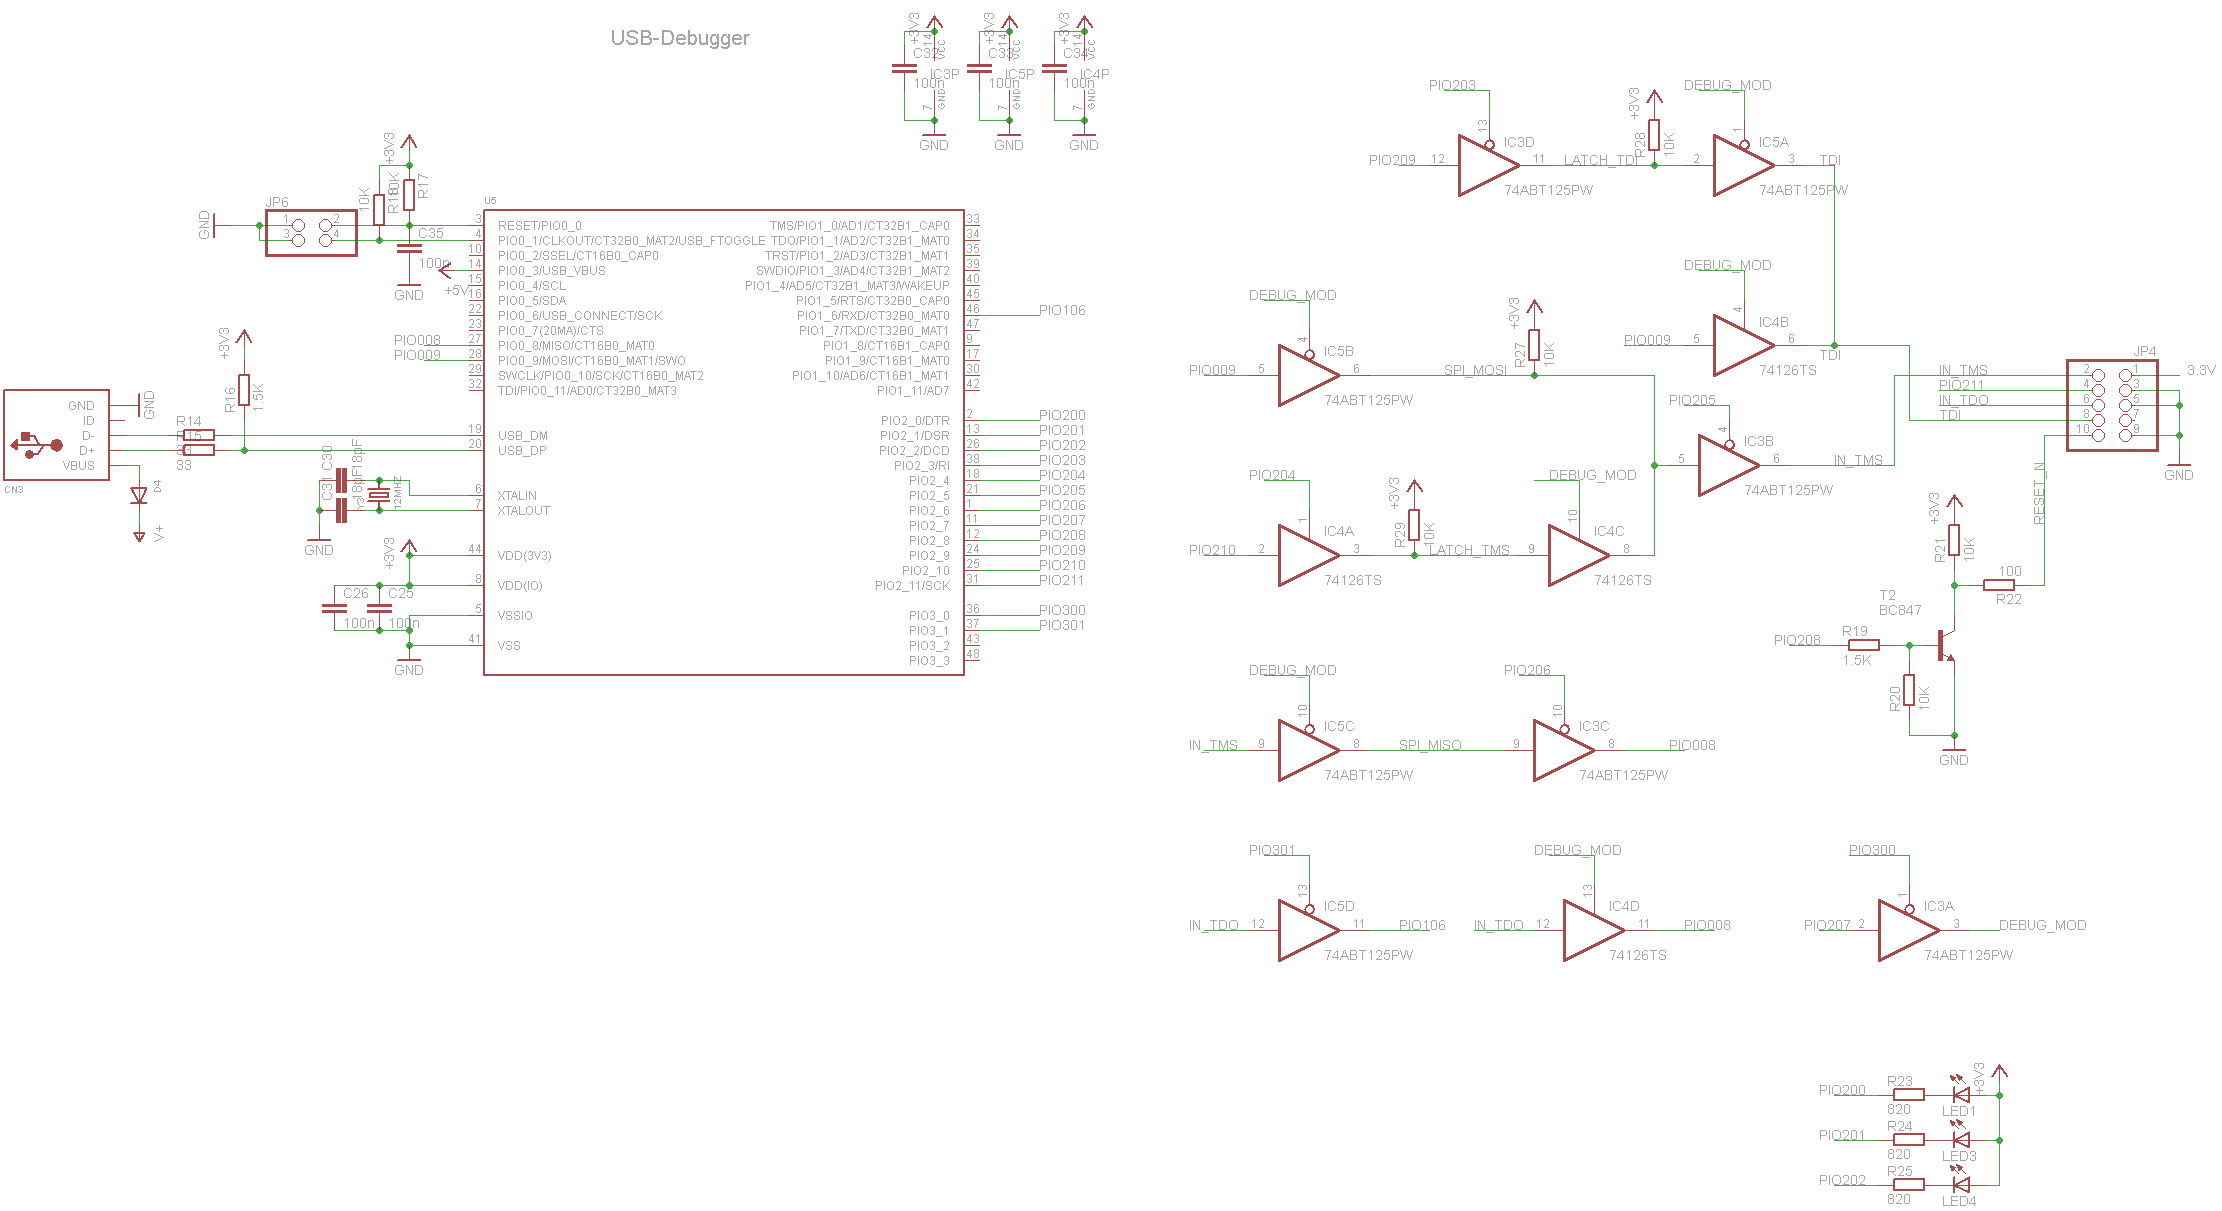 SimpleCortex Onboard debugger Schematic Diagram